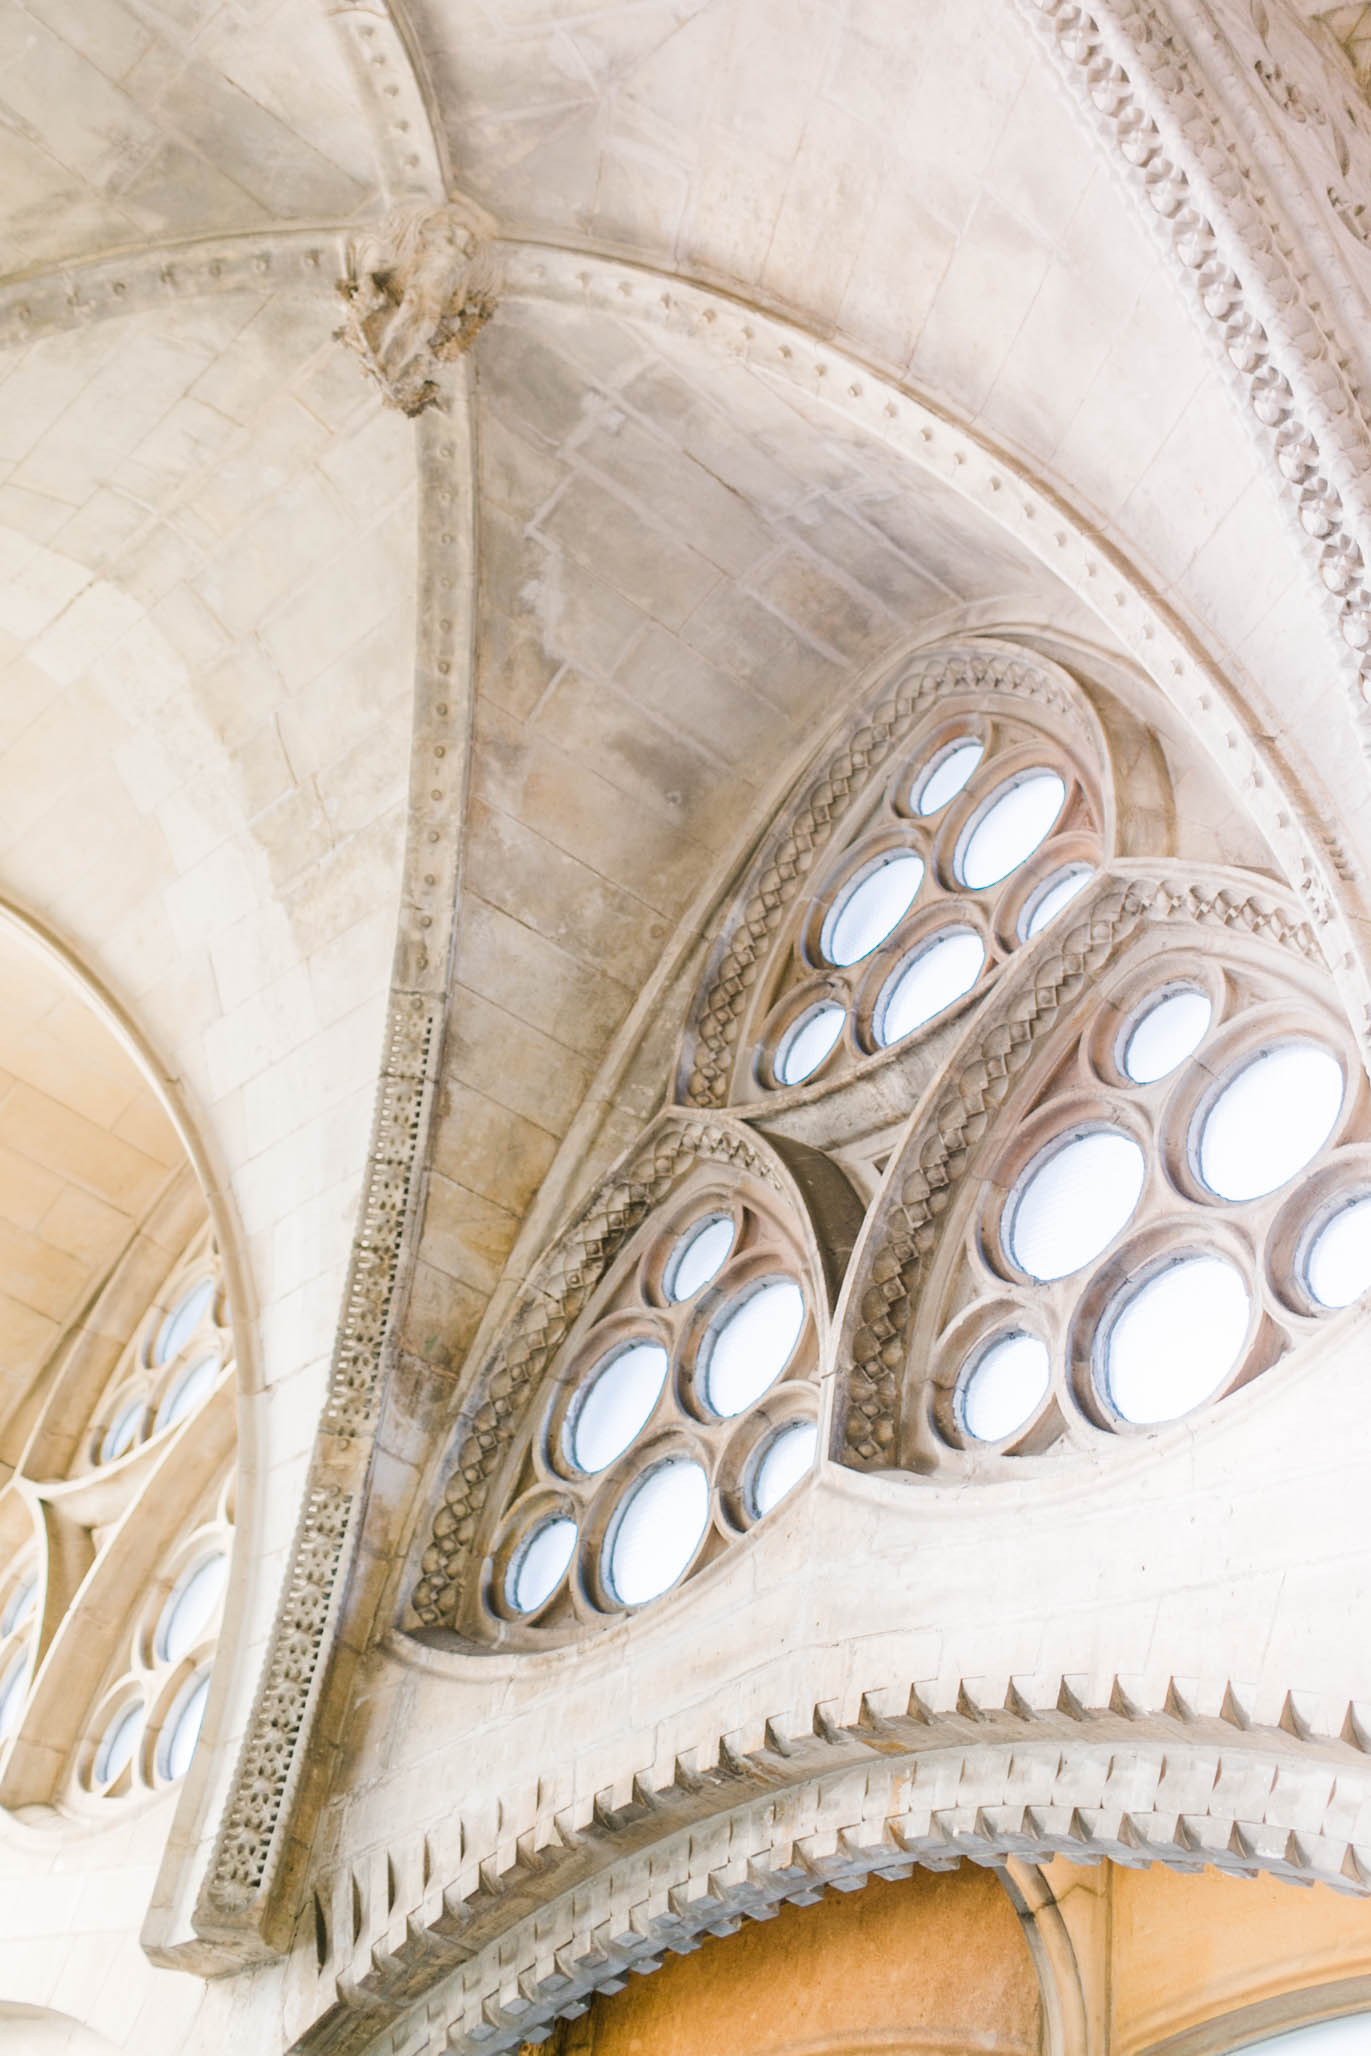 Just a few details of the interior space of Sagrada Familia.